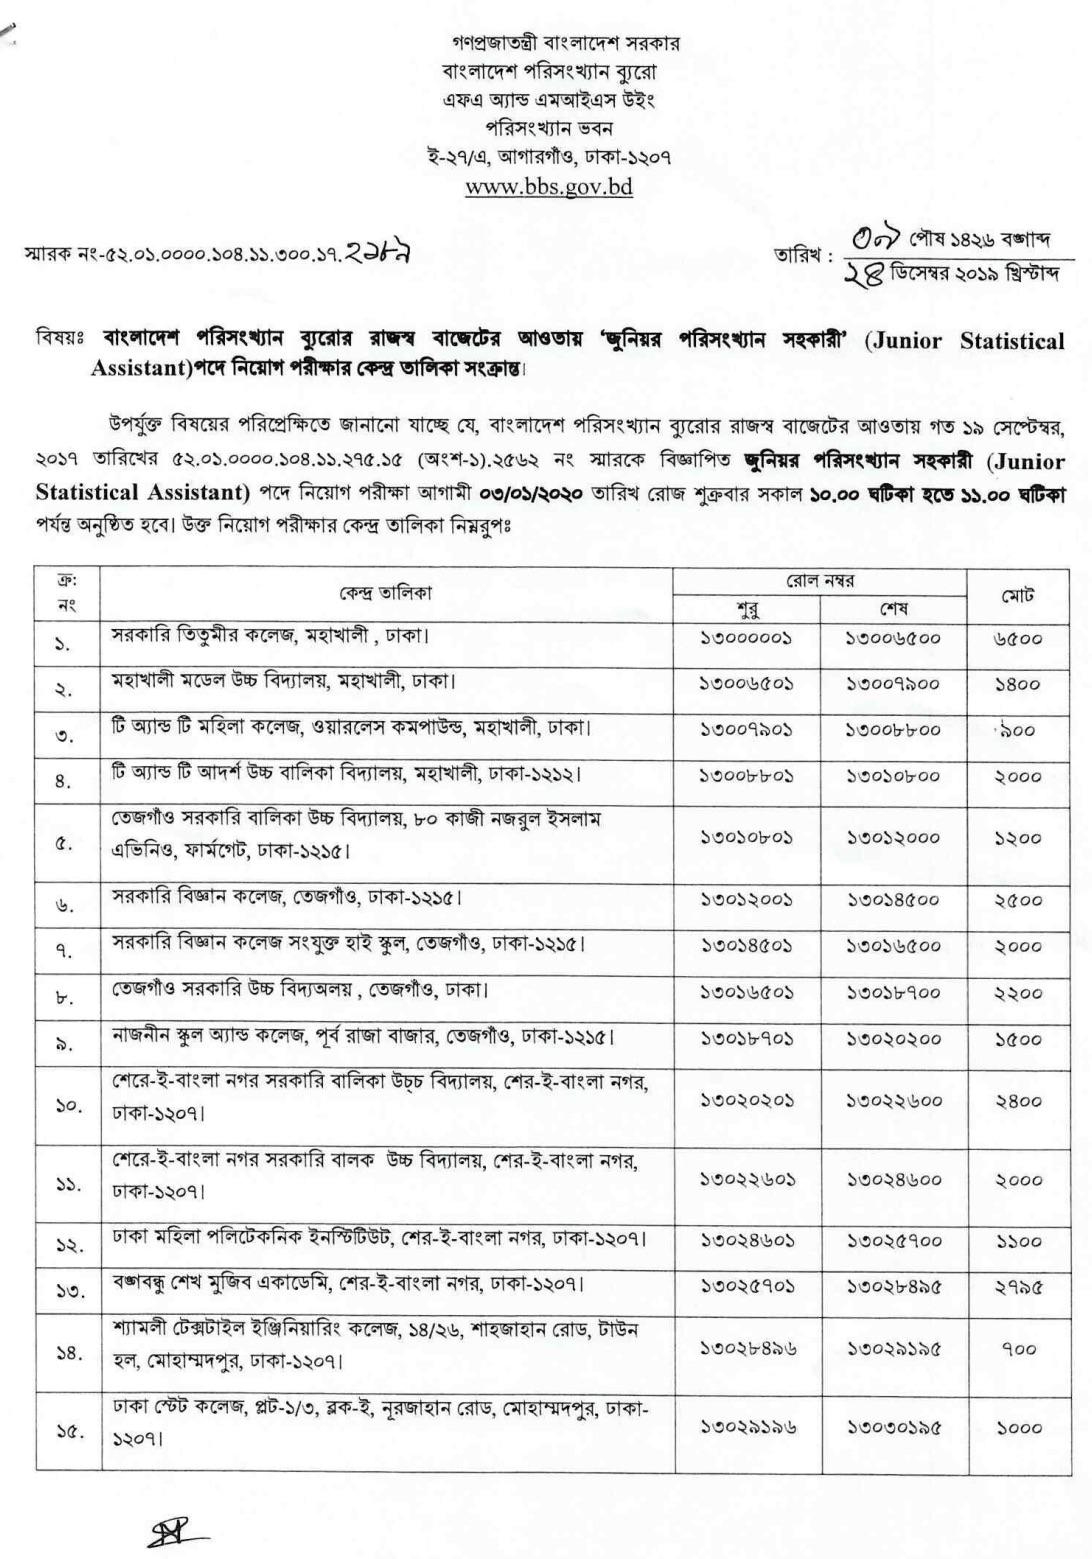 Bangladesh Bureau of Statistics (BBS) Exam Notice 2020